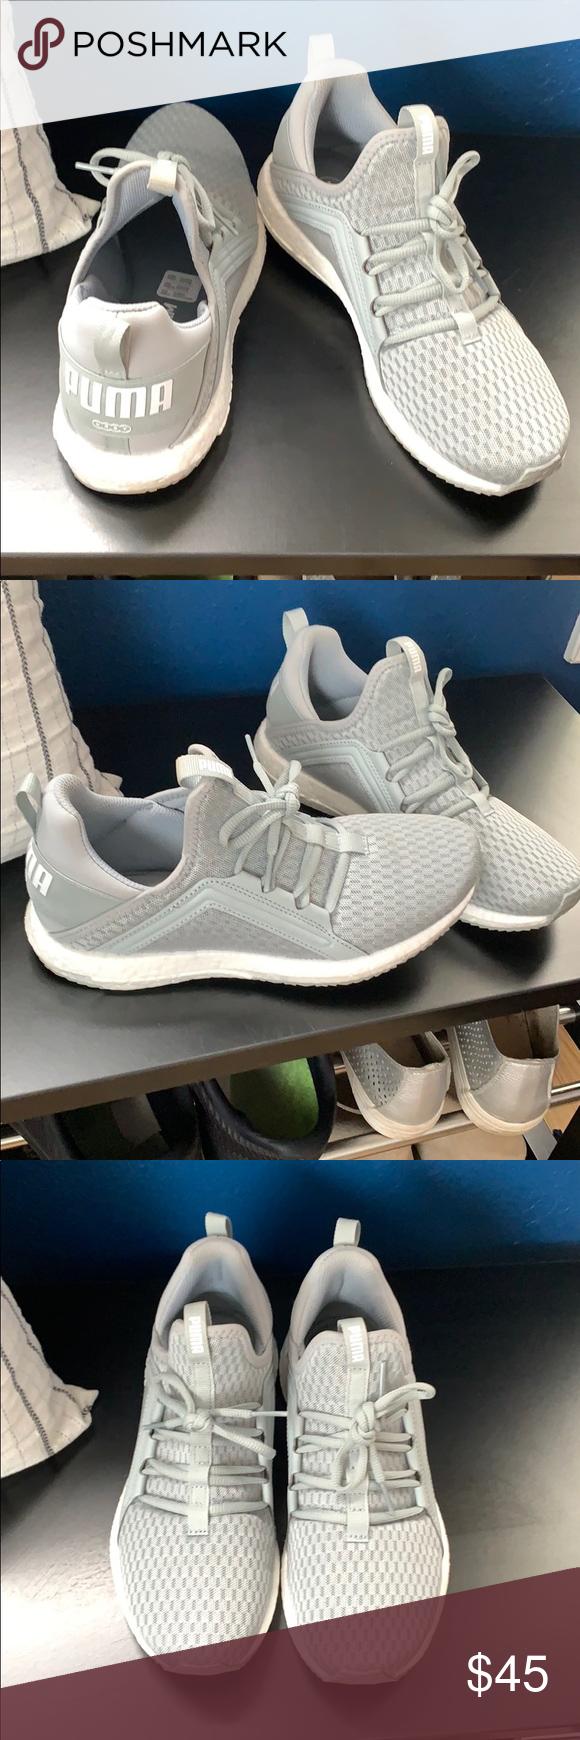 100% echt komplettes Angebot an Artikeln riesige Auswahl an Puma soft foam sneakers Gray and white Pumas. I literally ...